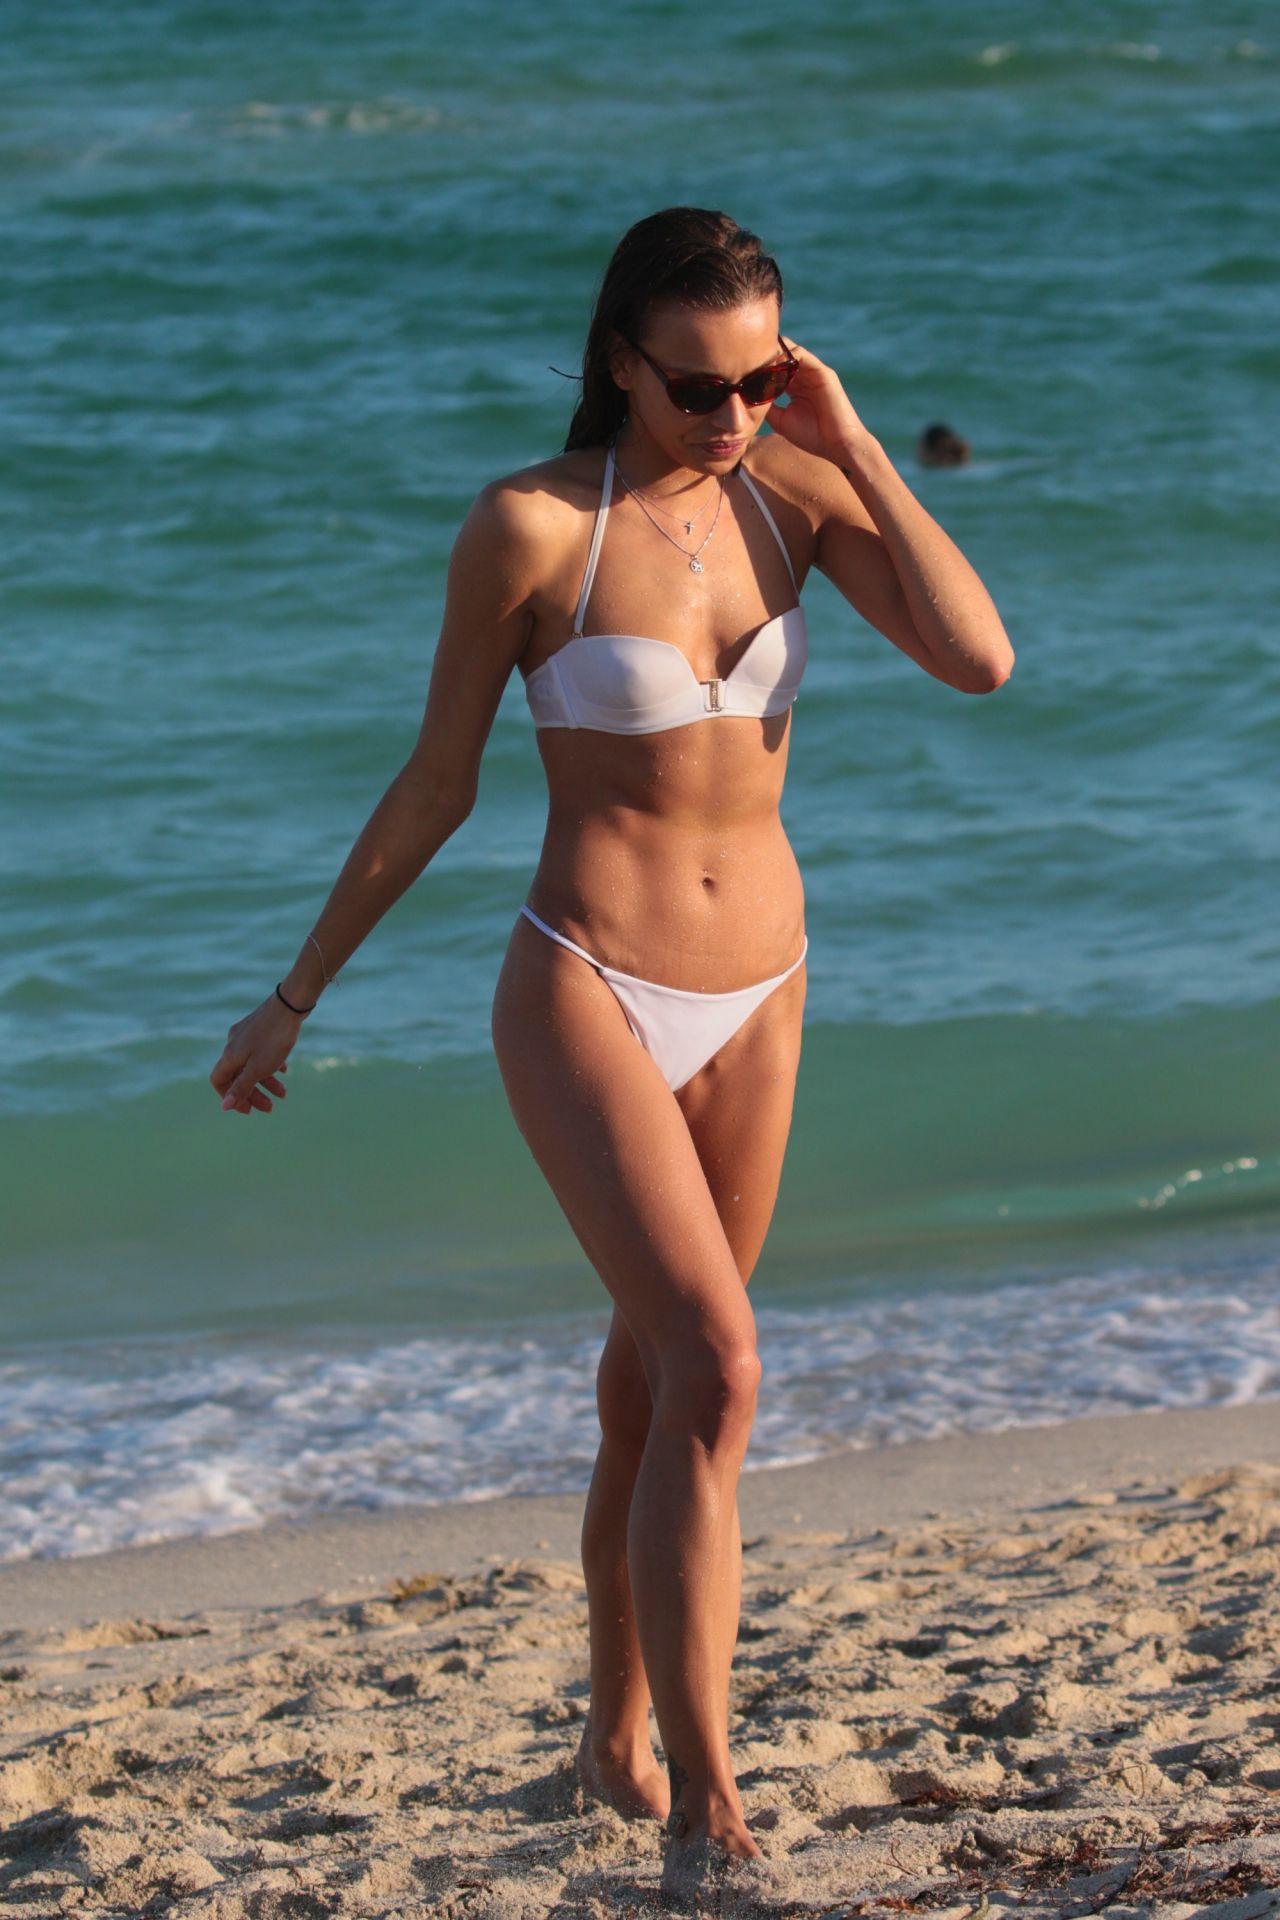 Celebrites Meri Gulin nudes (15 photos), Tits, Bikini, Instagram, bra 2015